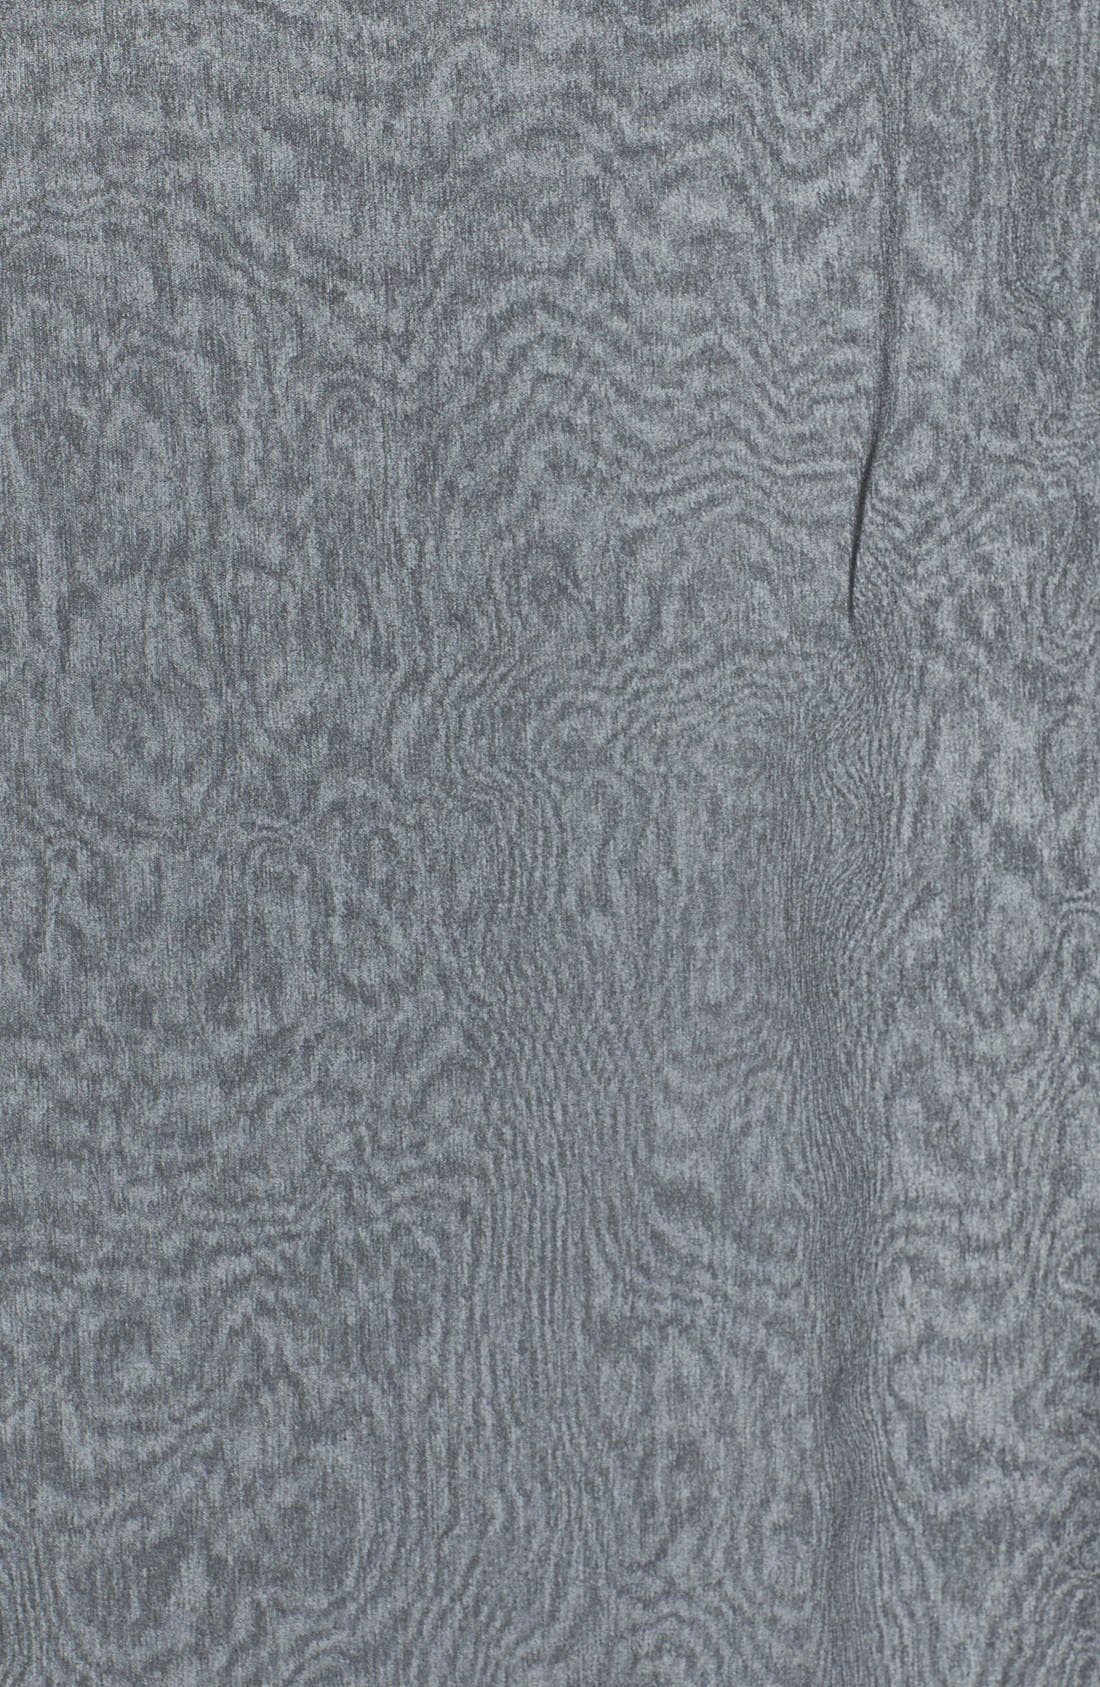 Silk Chiffon Wrap,                             Alternate thumbnail 7, color,                             BLACK